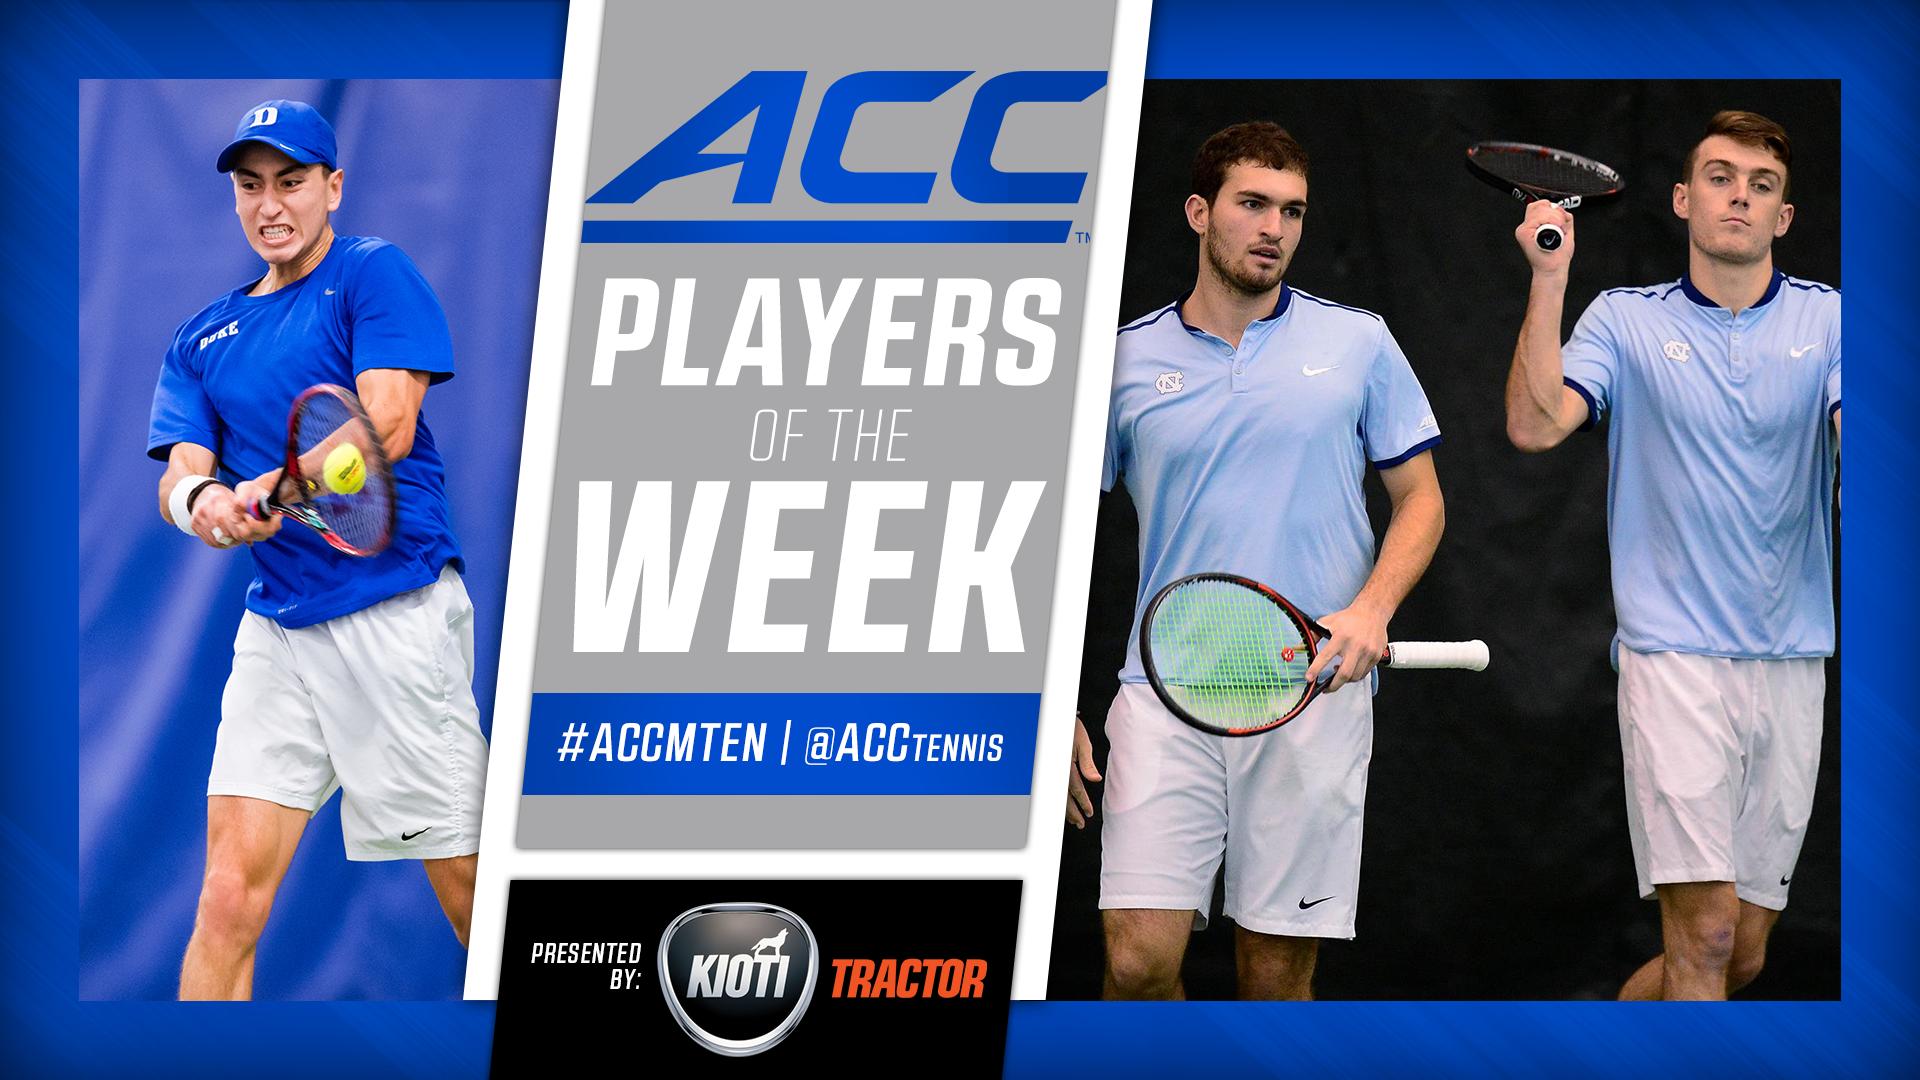 ACC Announces Men's Tennis Weekly Awards